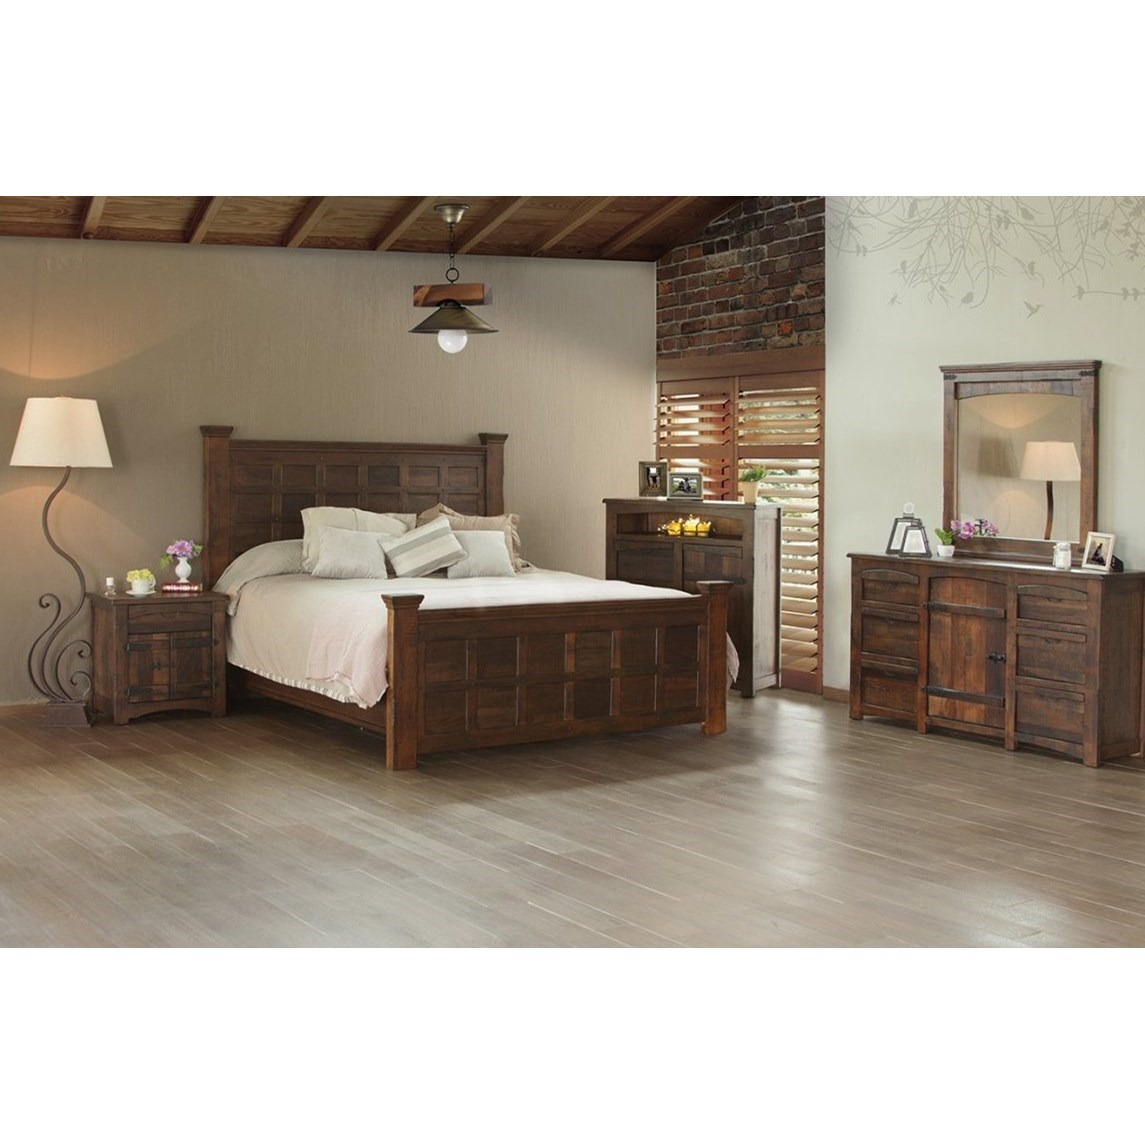 International Furniture Direct Mezcal Rustic Great Chest